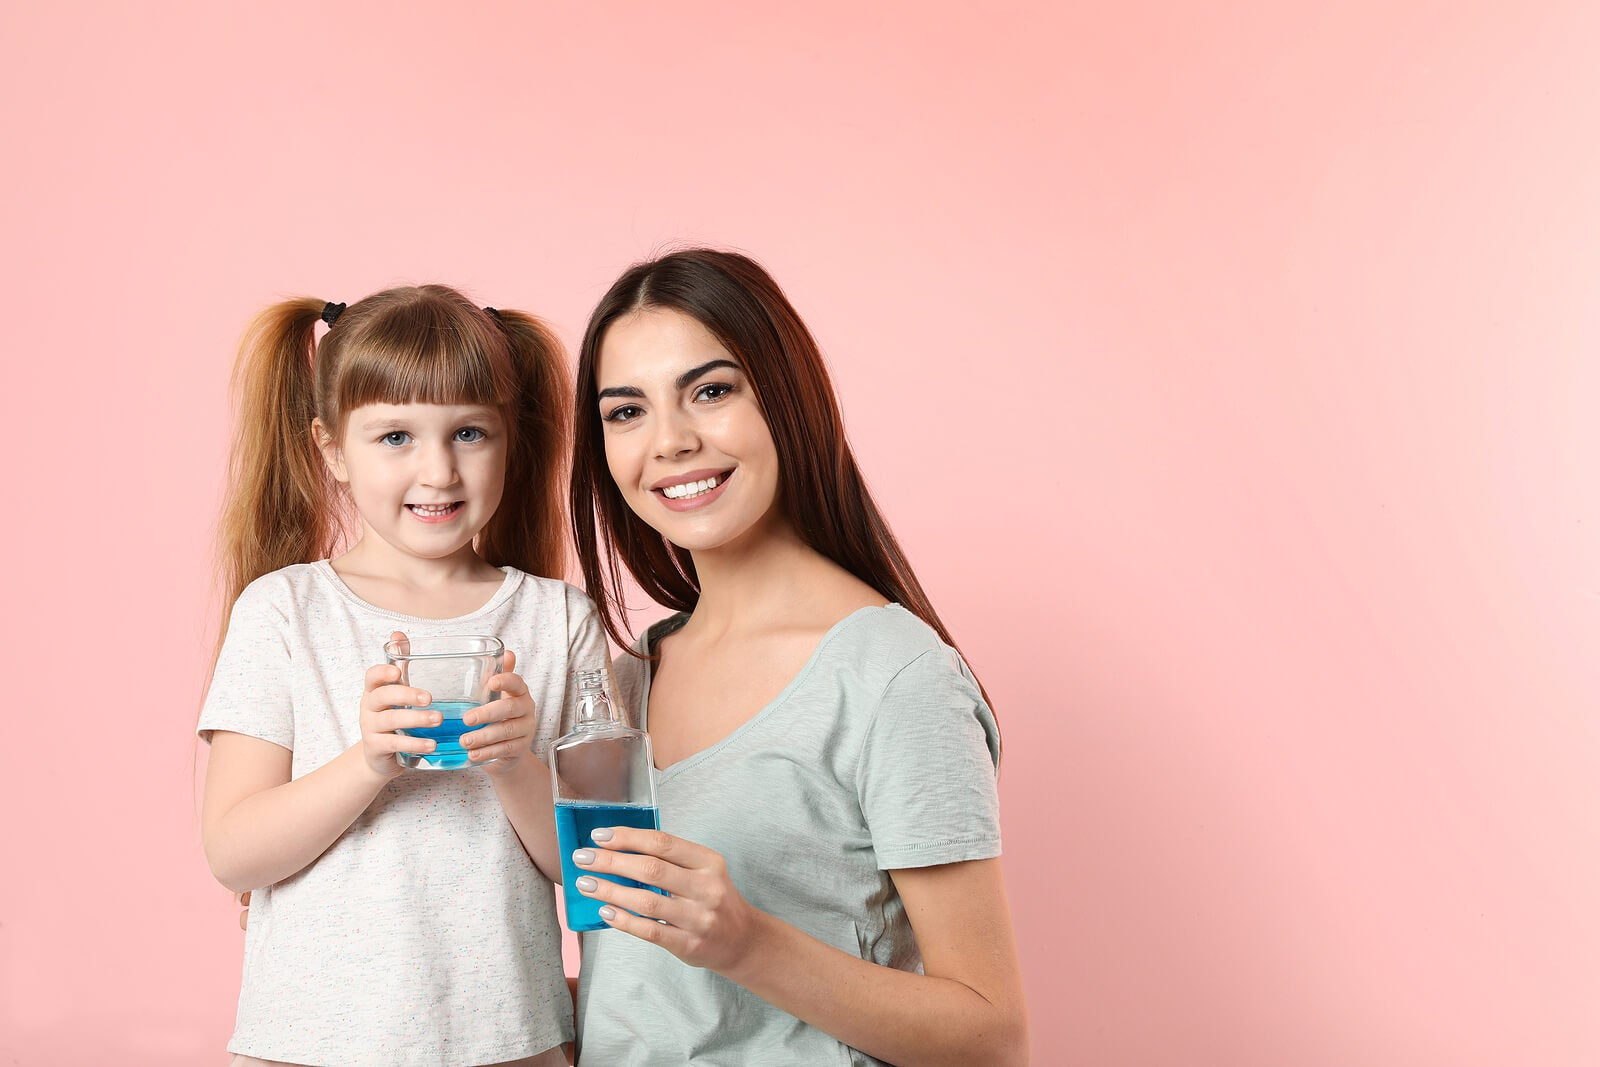 Madre e hija llevando a cabo una rutina de enjuague bucal para niños.